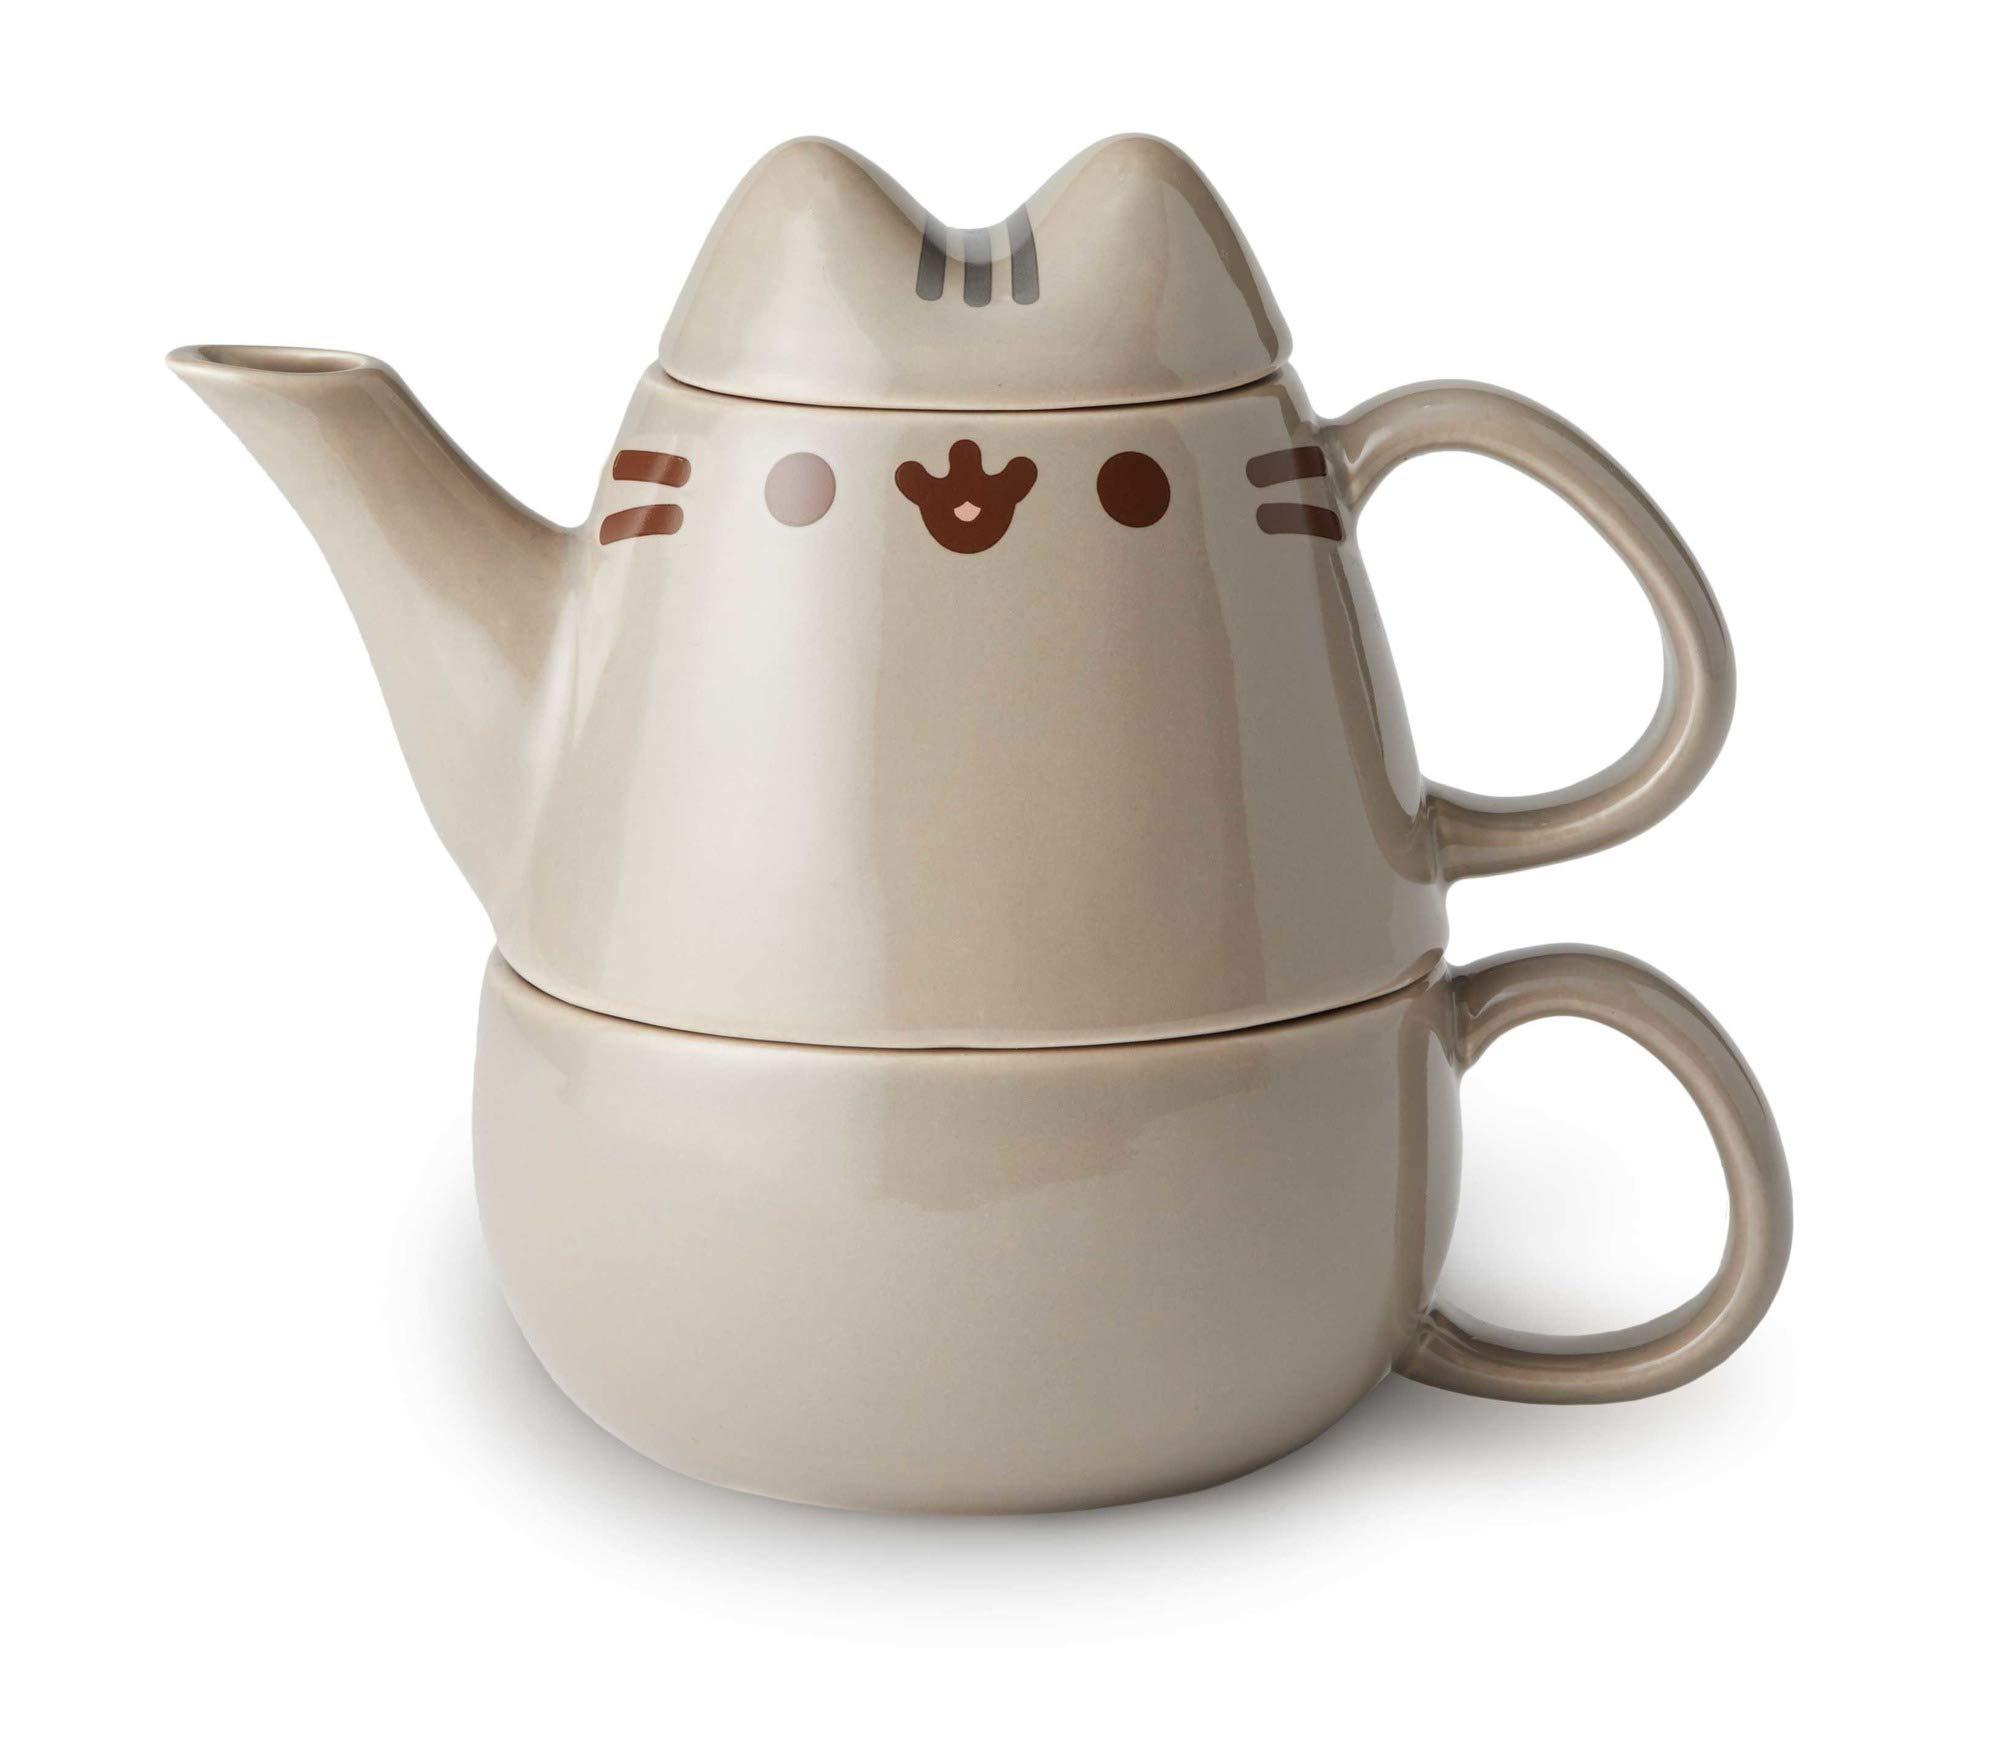 Enesco Our Name is Mud, 6002675, Pusheen ''Tea for One'' Tea Kit, 10 ounces